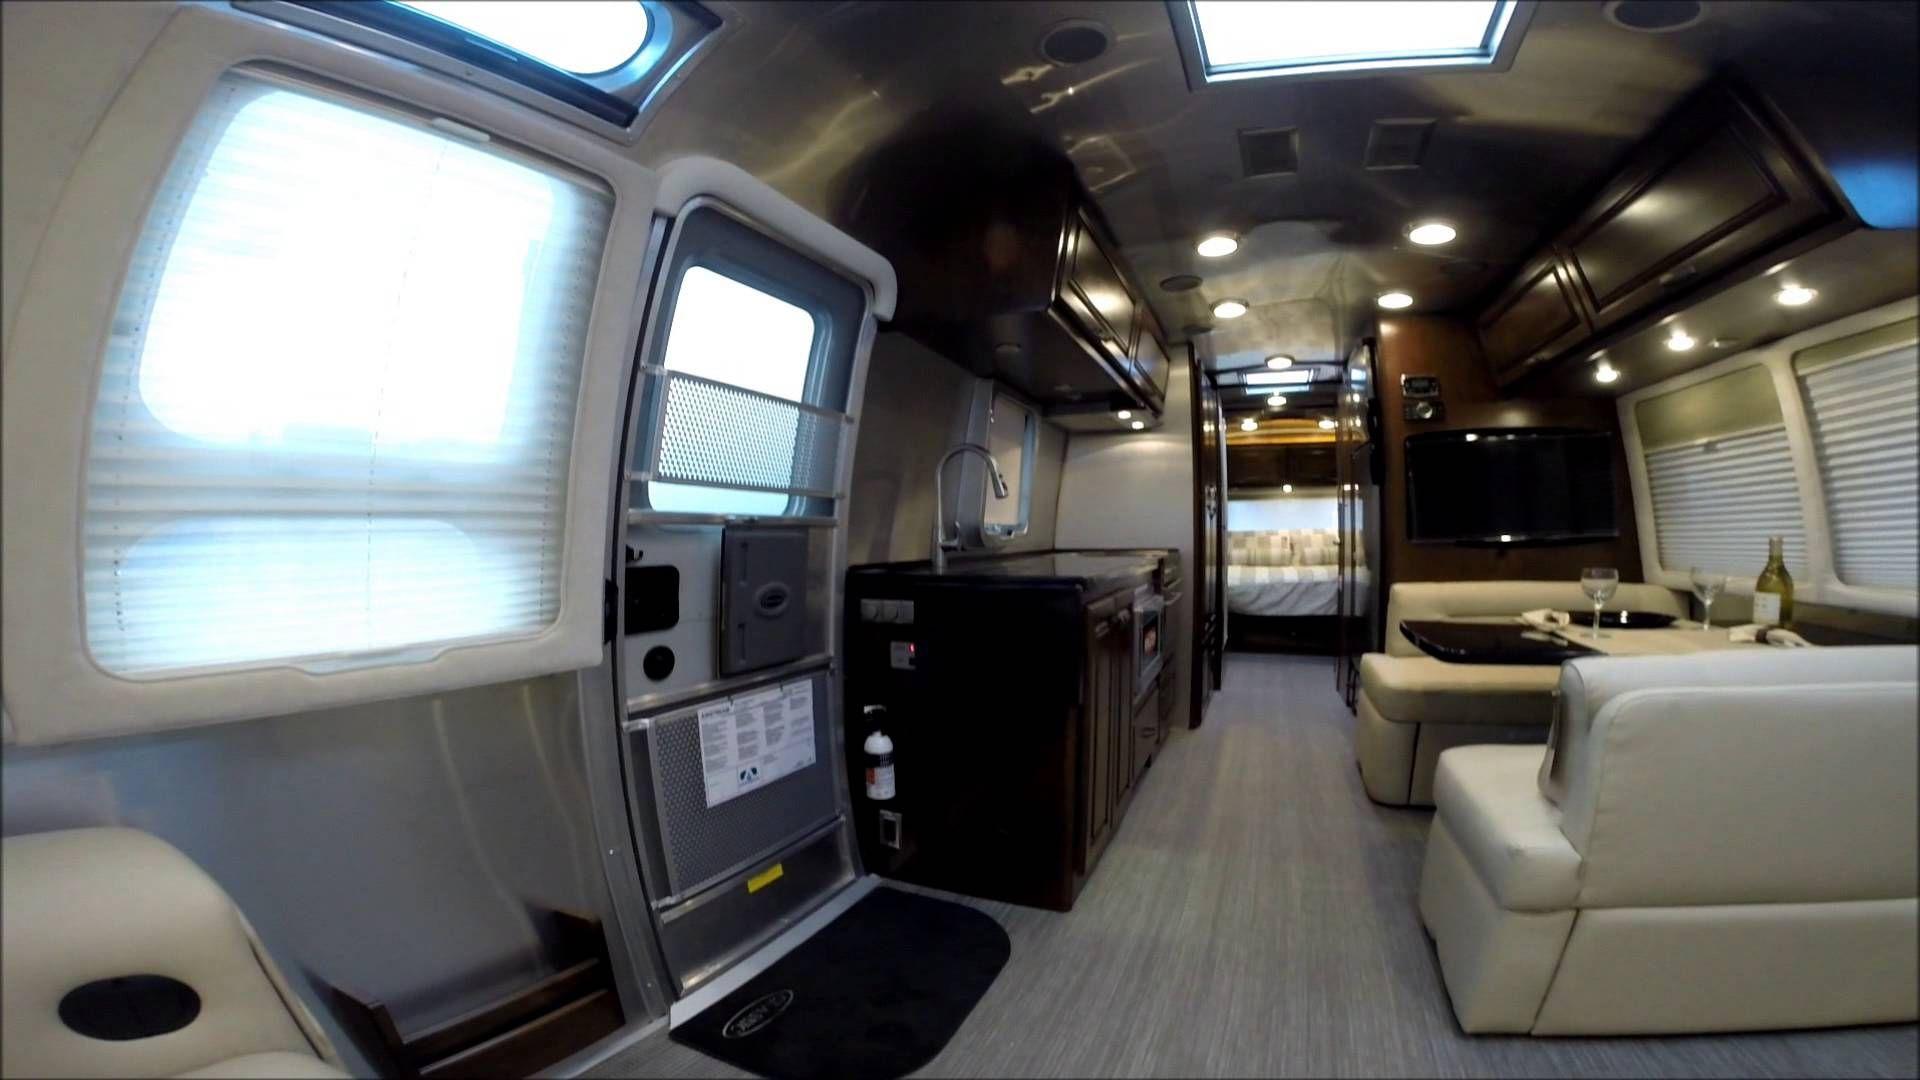 Walk Through 2015 Airstream Classic 30J Travel Trailer For